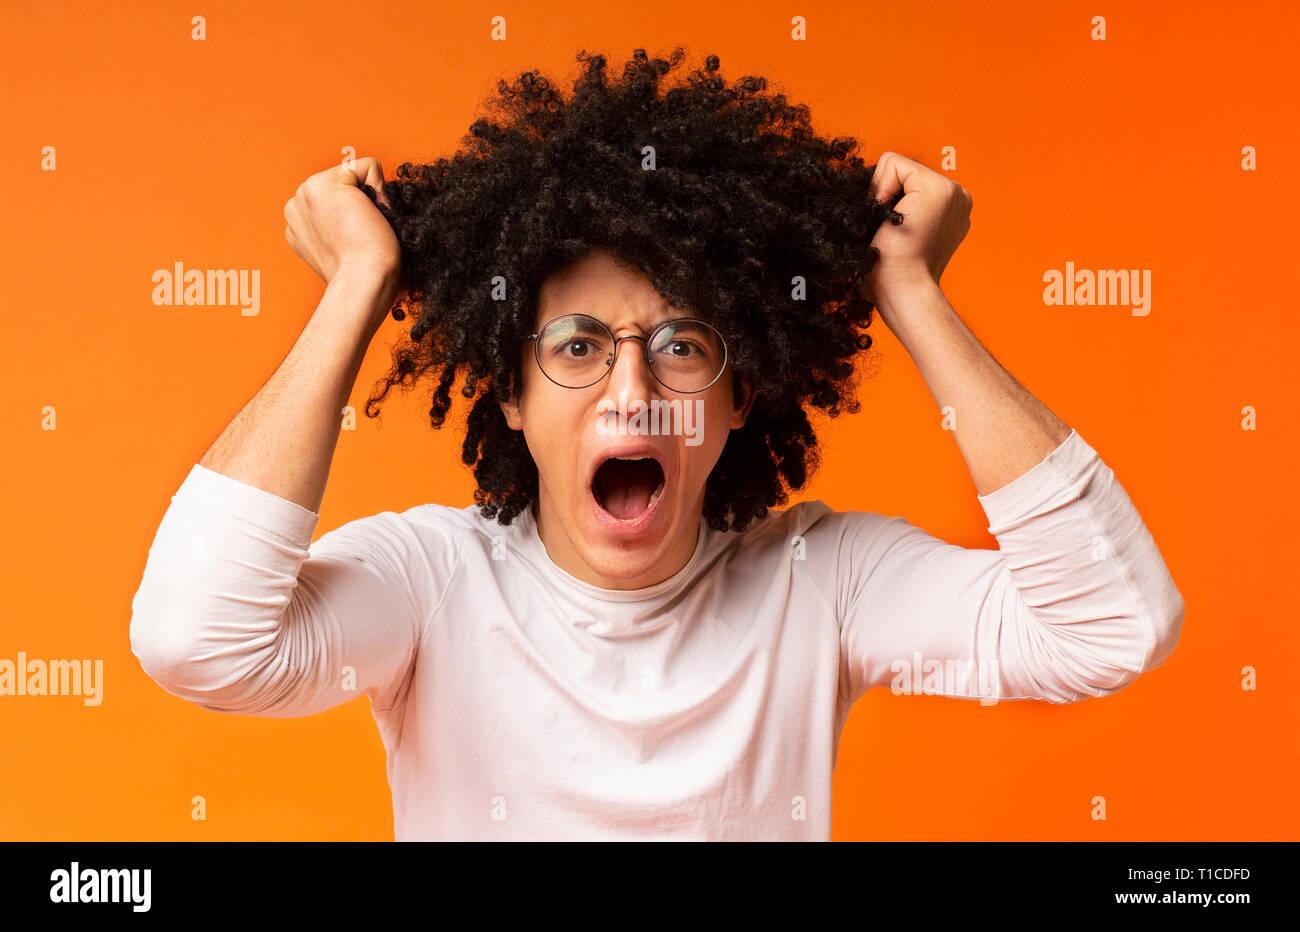 Emotional black man in despair pulling out his hair - Stock Image